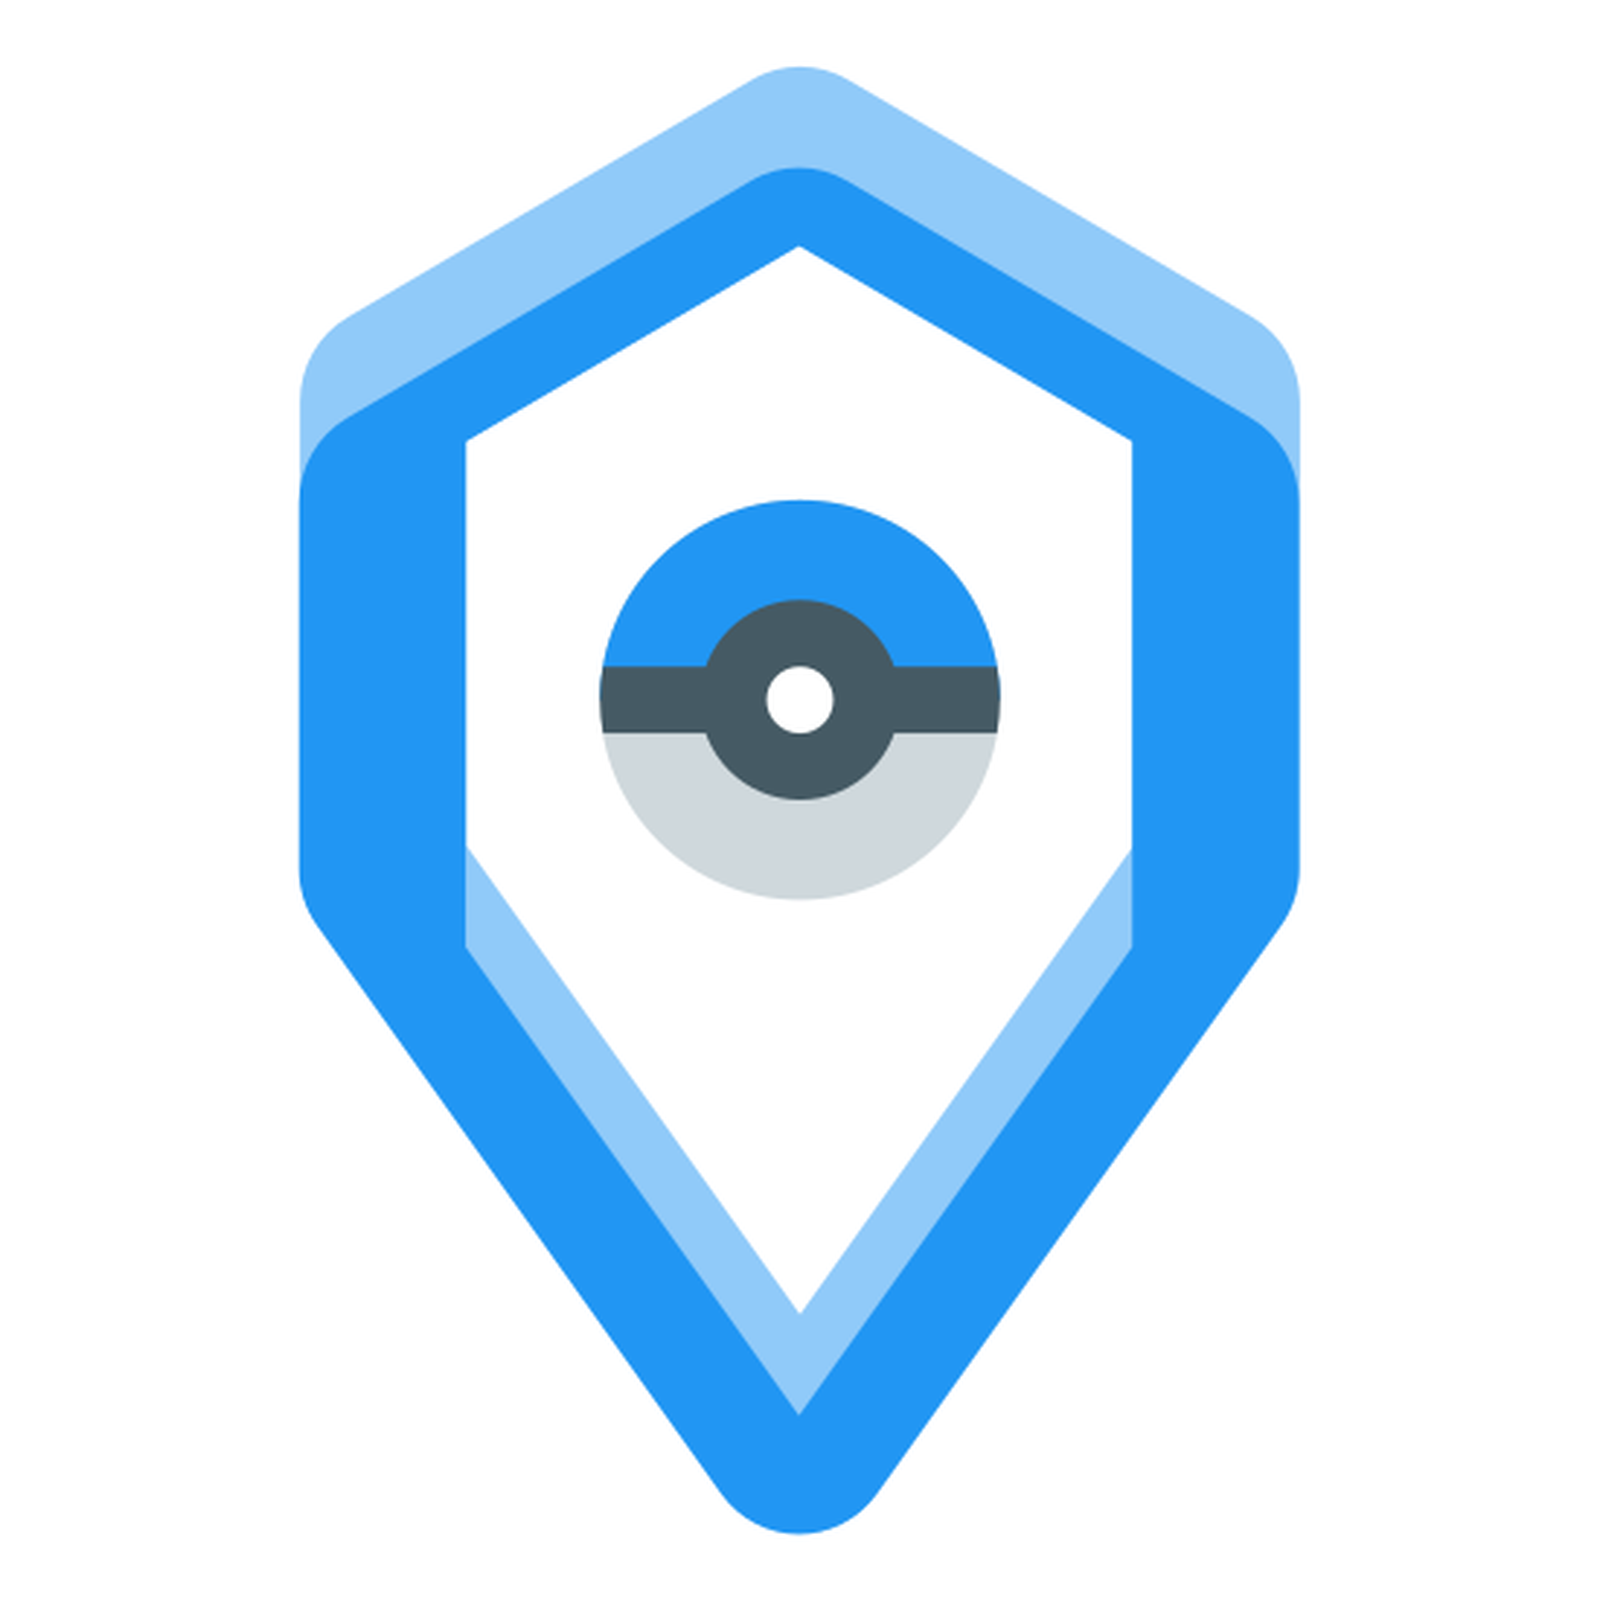 Blueteam icon